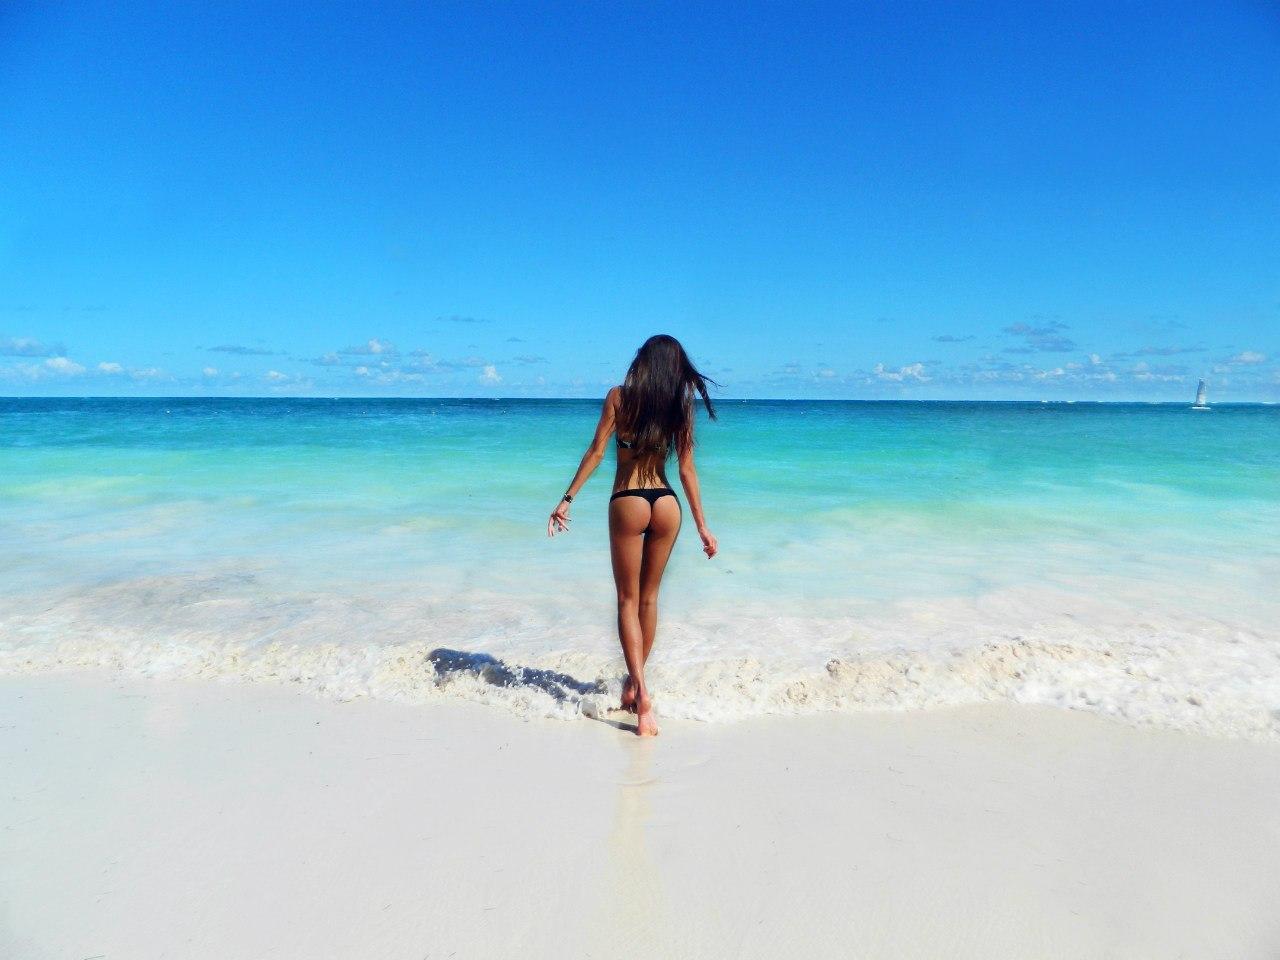 Фото на аву для девушек брюнеток на пляже